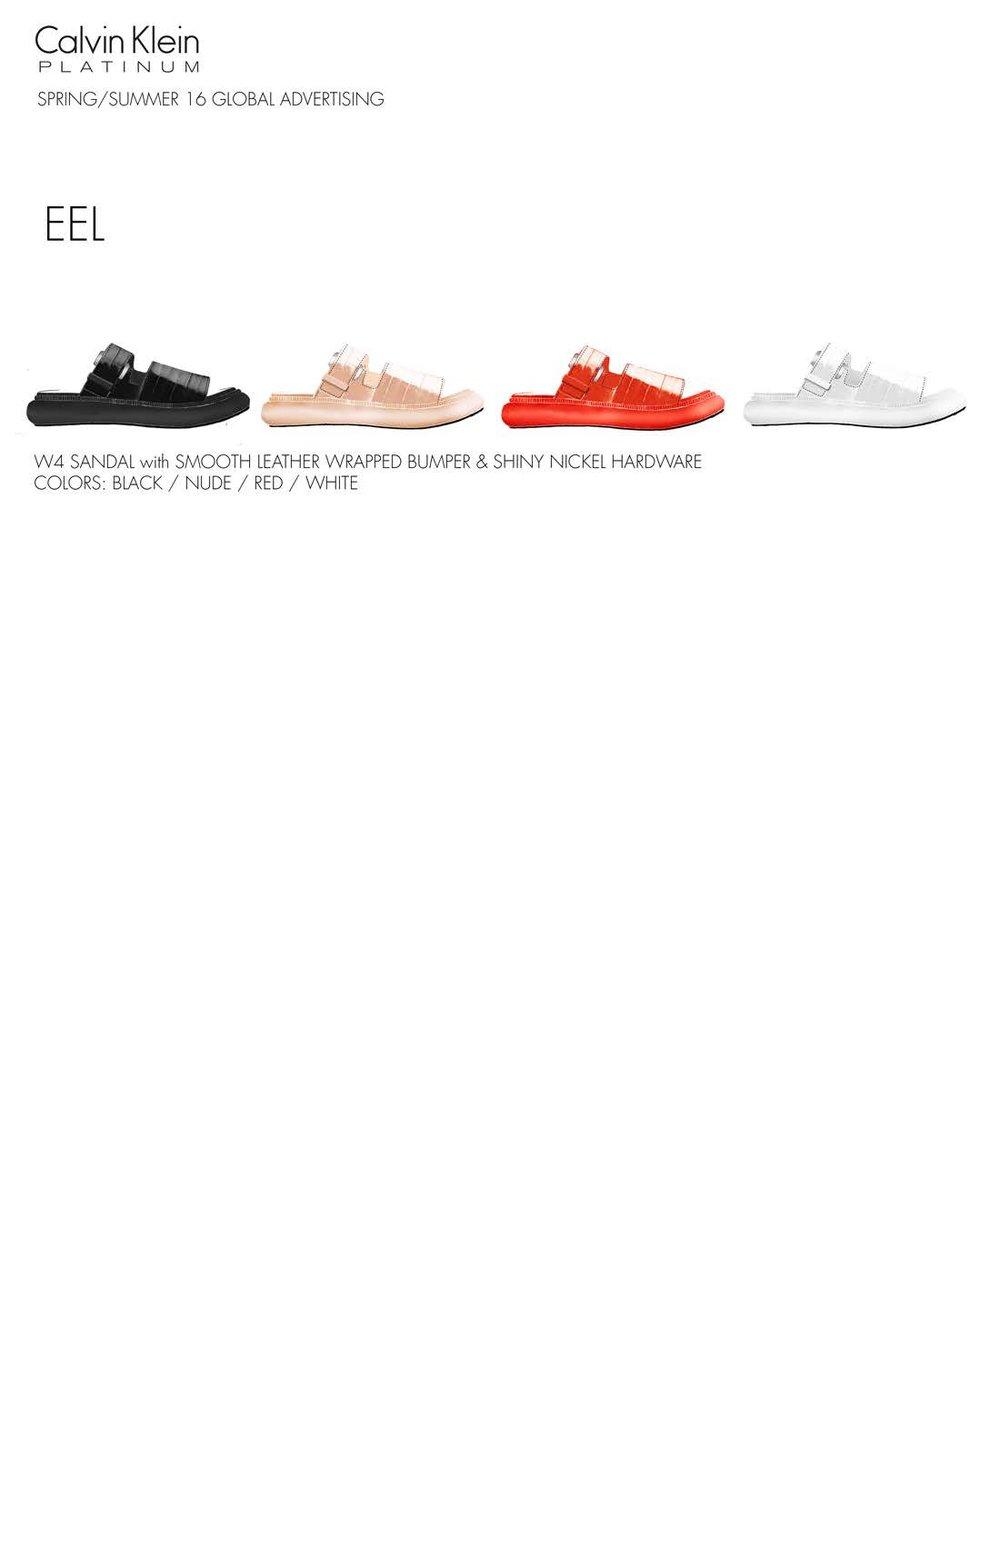 7.KGRESS Portfolio-SS16 CKP AD Footwear_Page_15.jpg